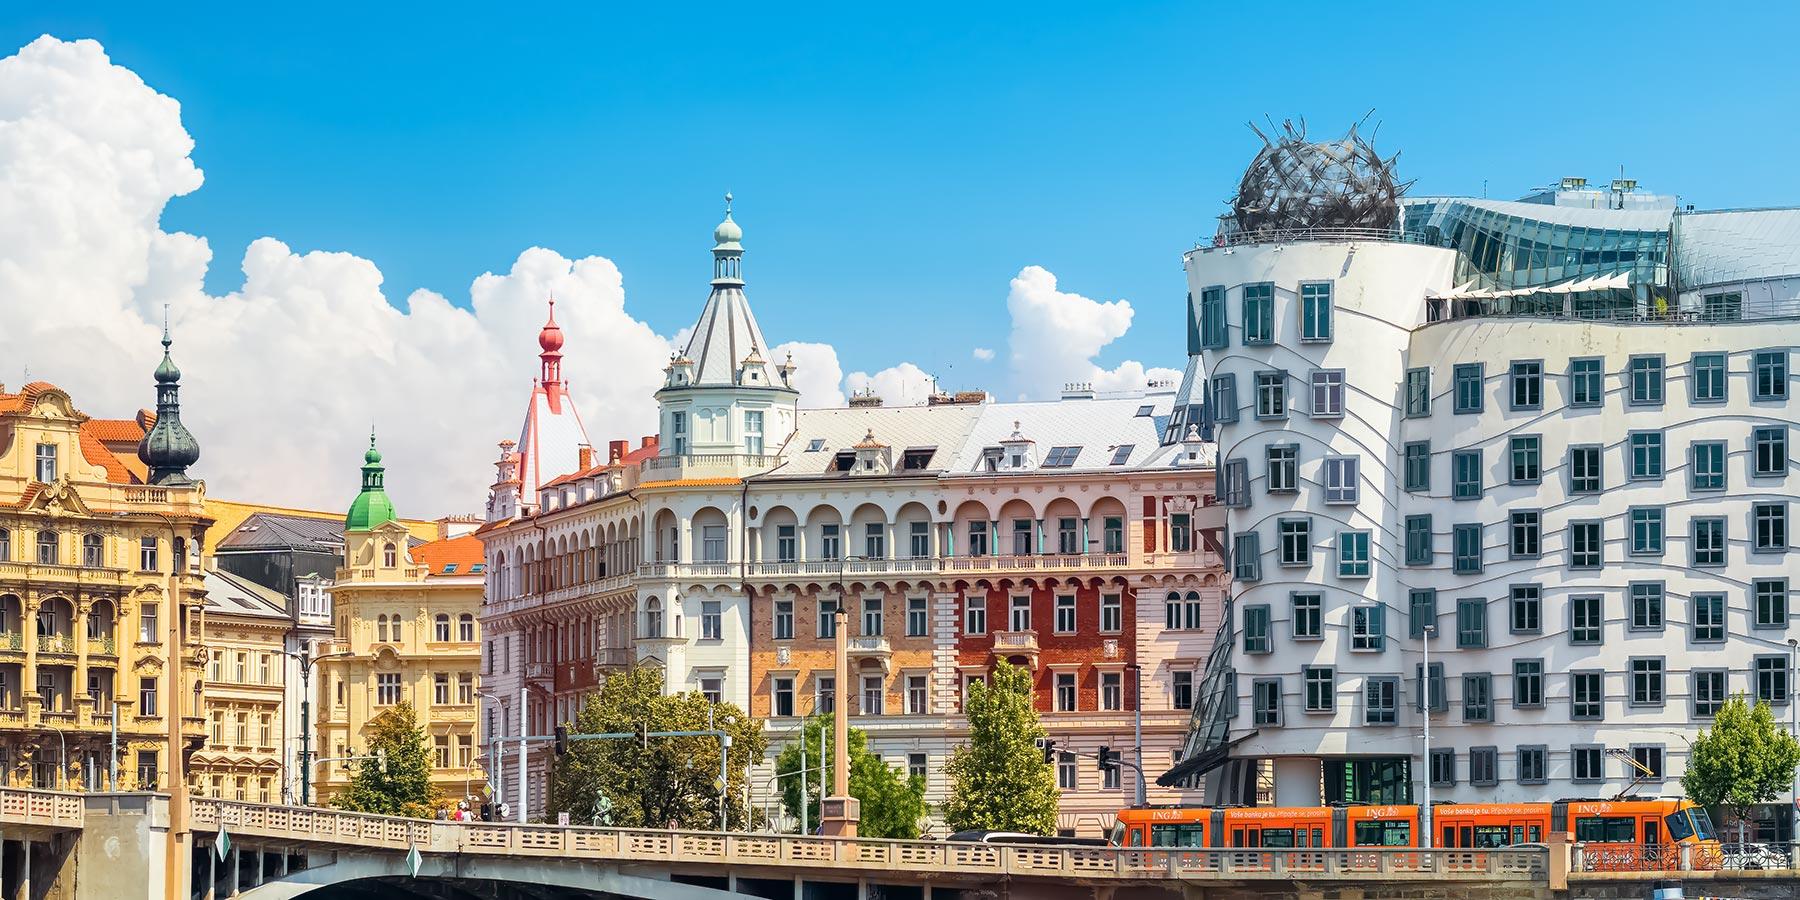 The Dancing House and Its Surroundings, Prague, Czechia